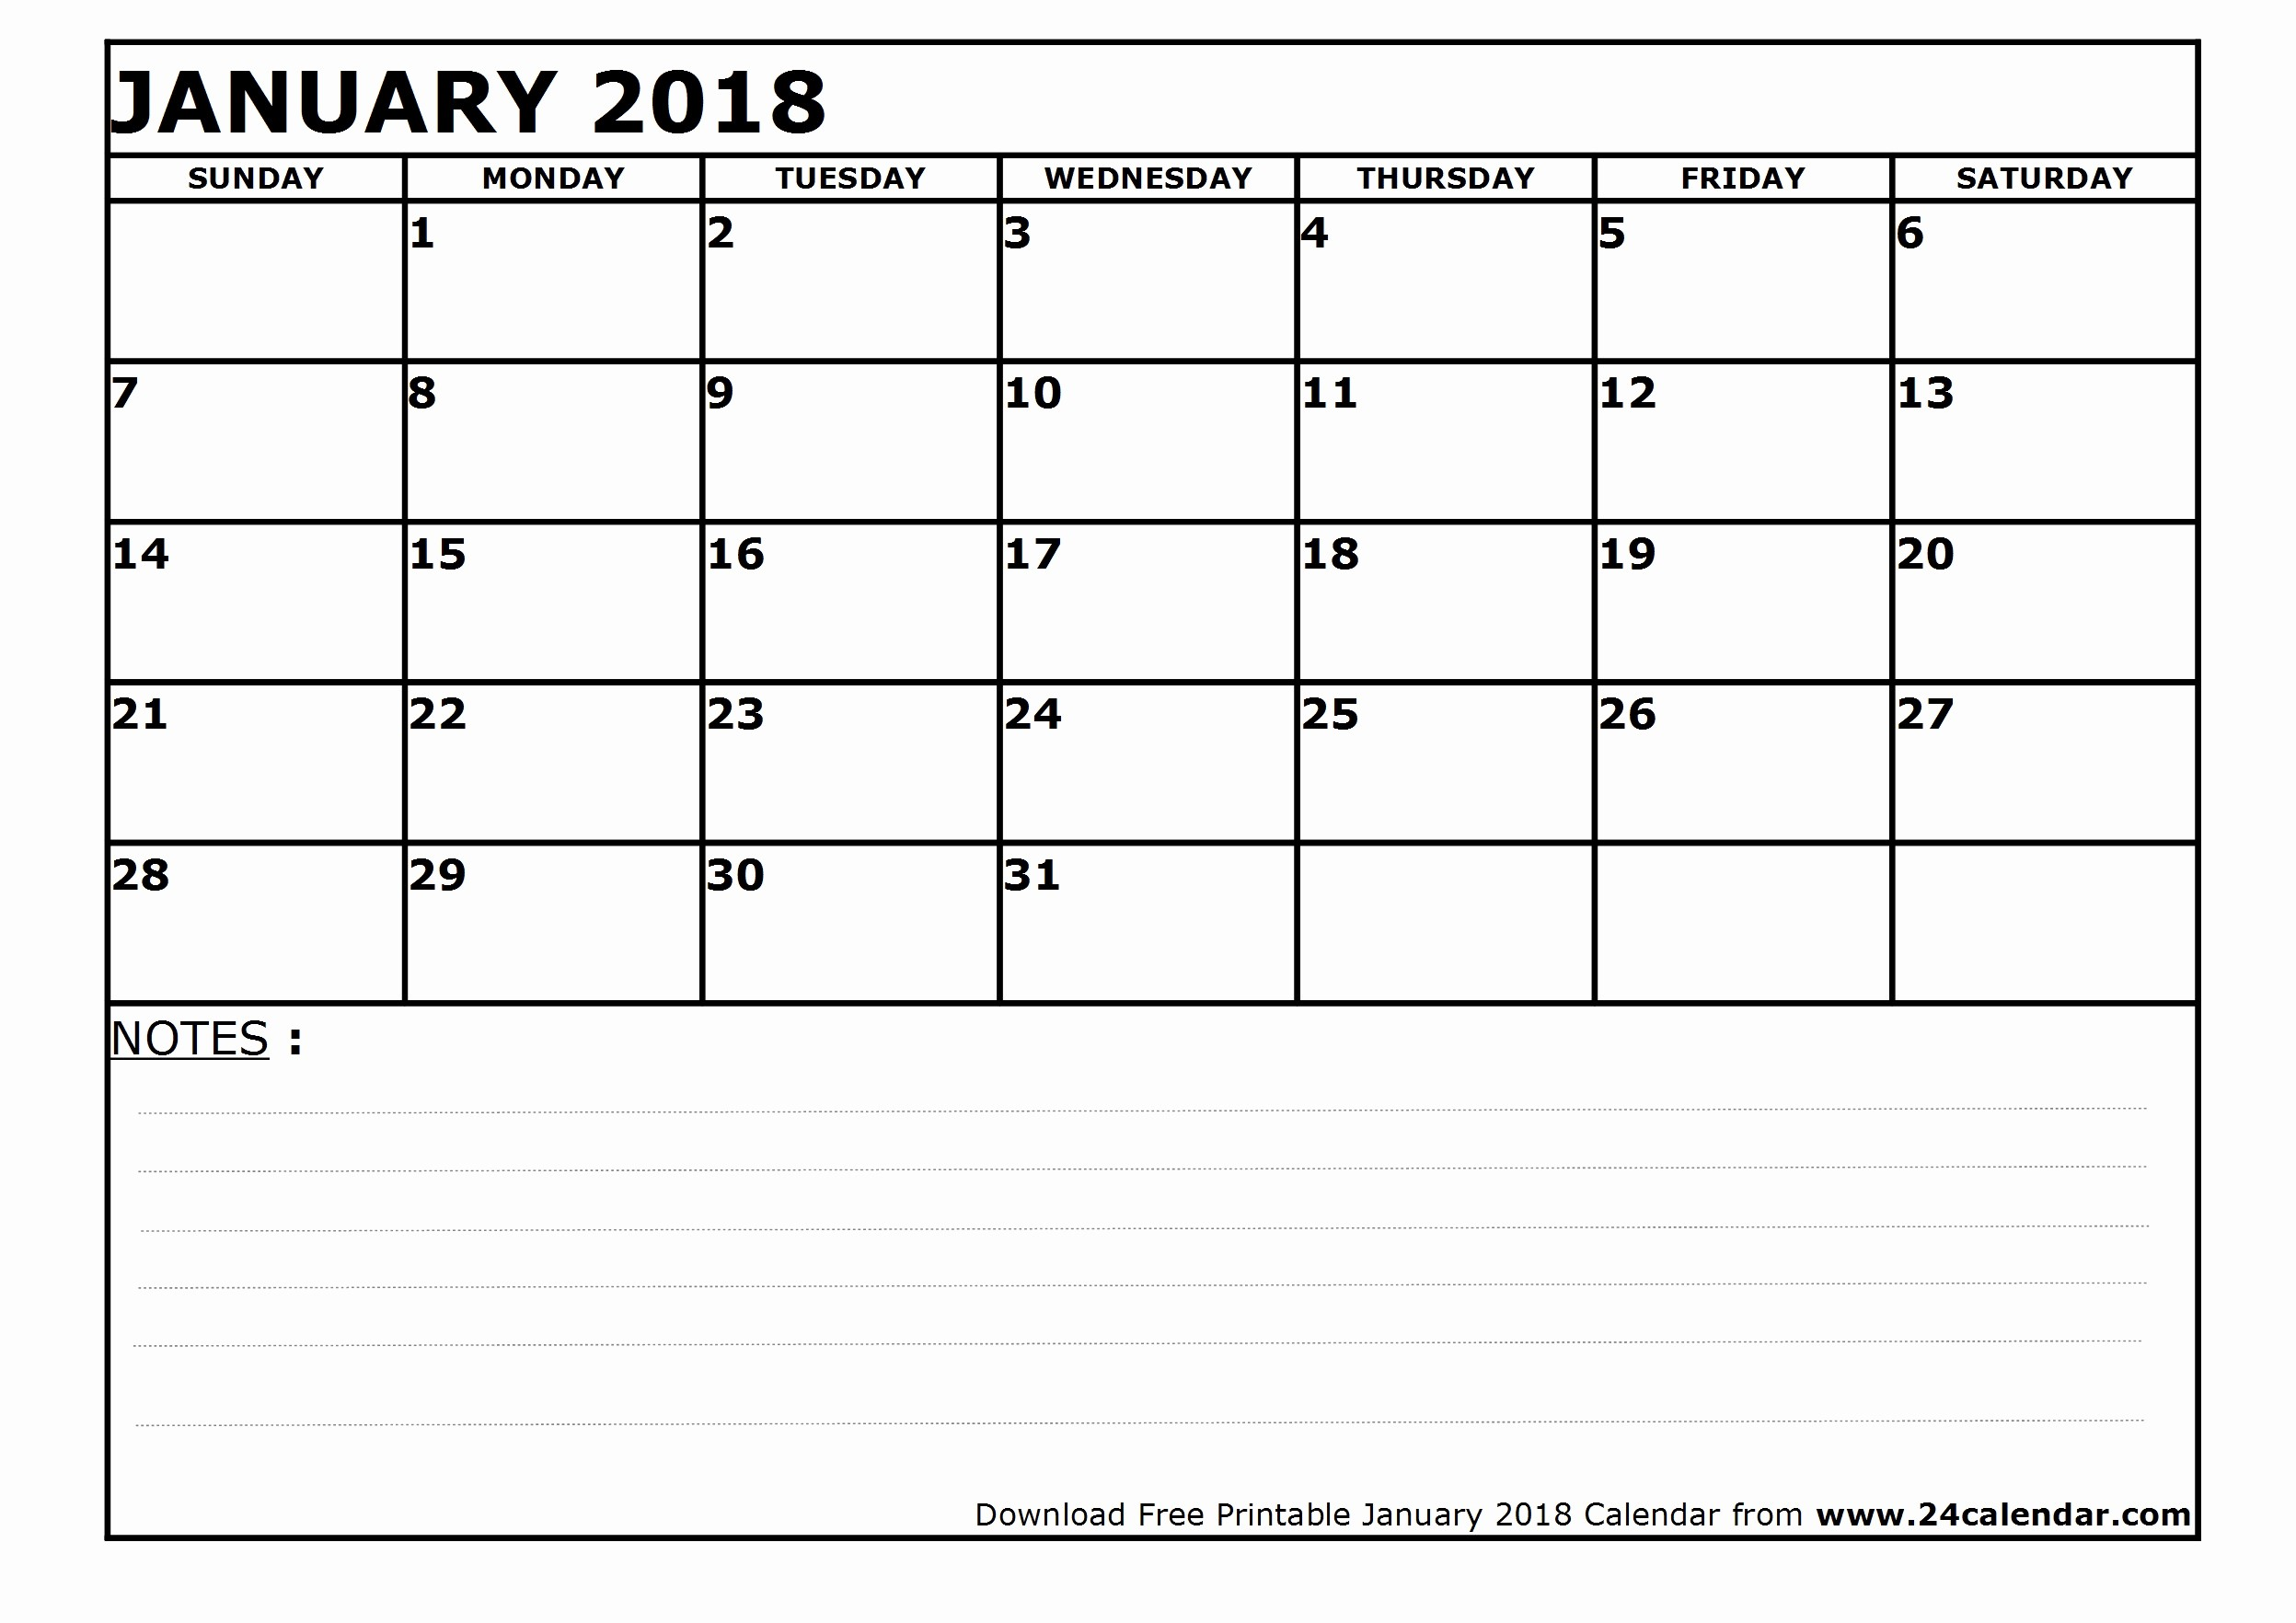 Blank January 2018 Calendar Printable Lovely Blank January 2018 Calendar In Printable format